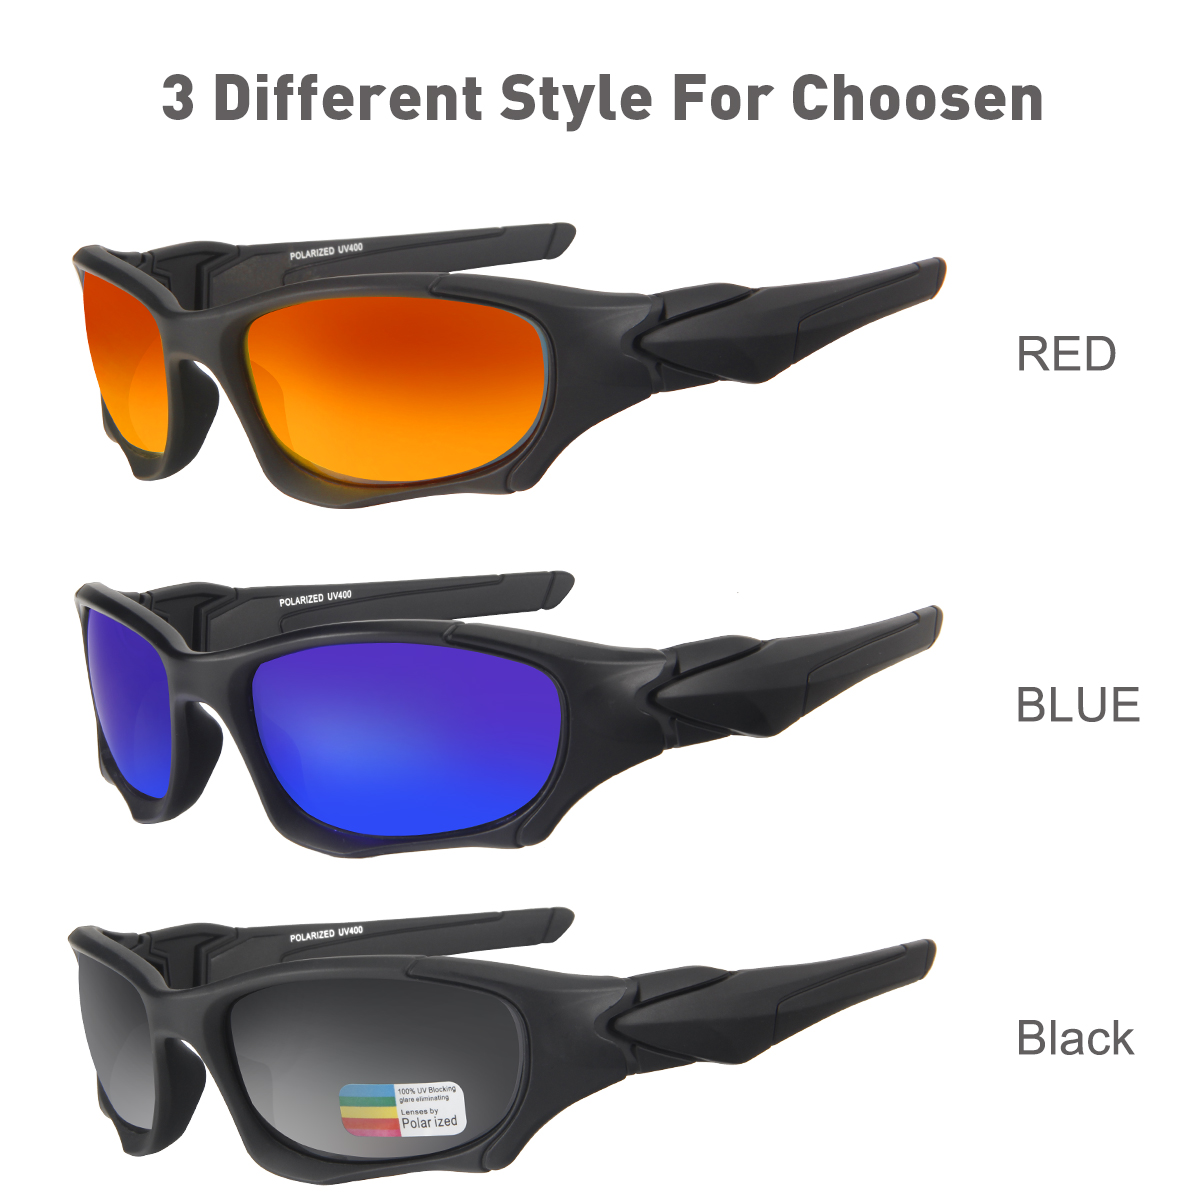 Queshark UV400 UltraLight Men Women Sunglasses Polarized Fishing Glasses Sports Goggles Cycling Climbing Hiking Fishing Eyewear 6